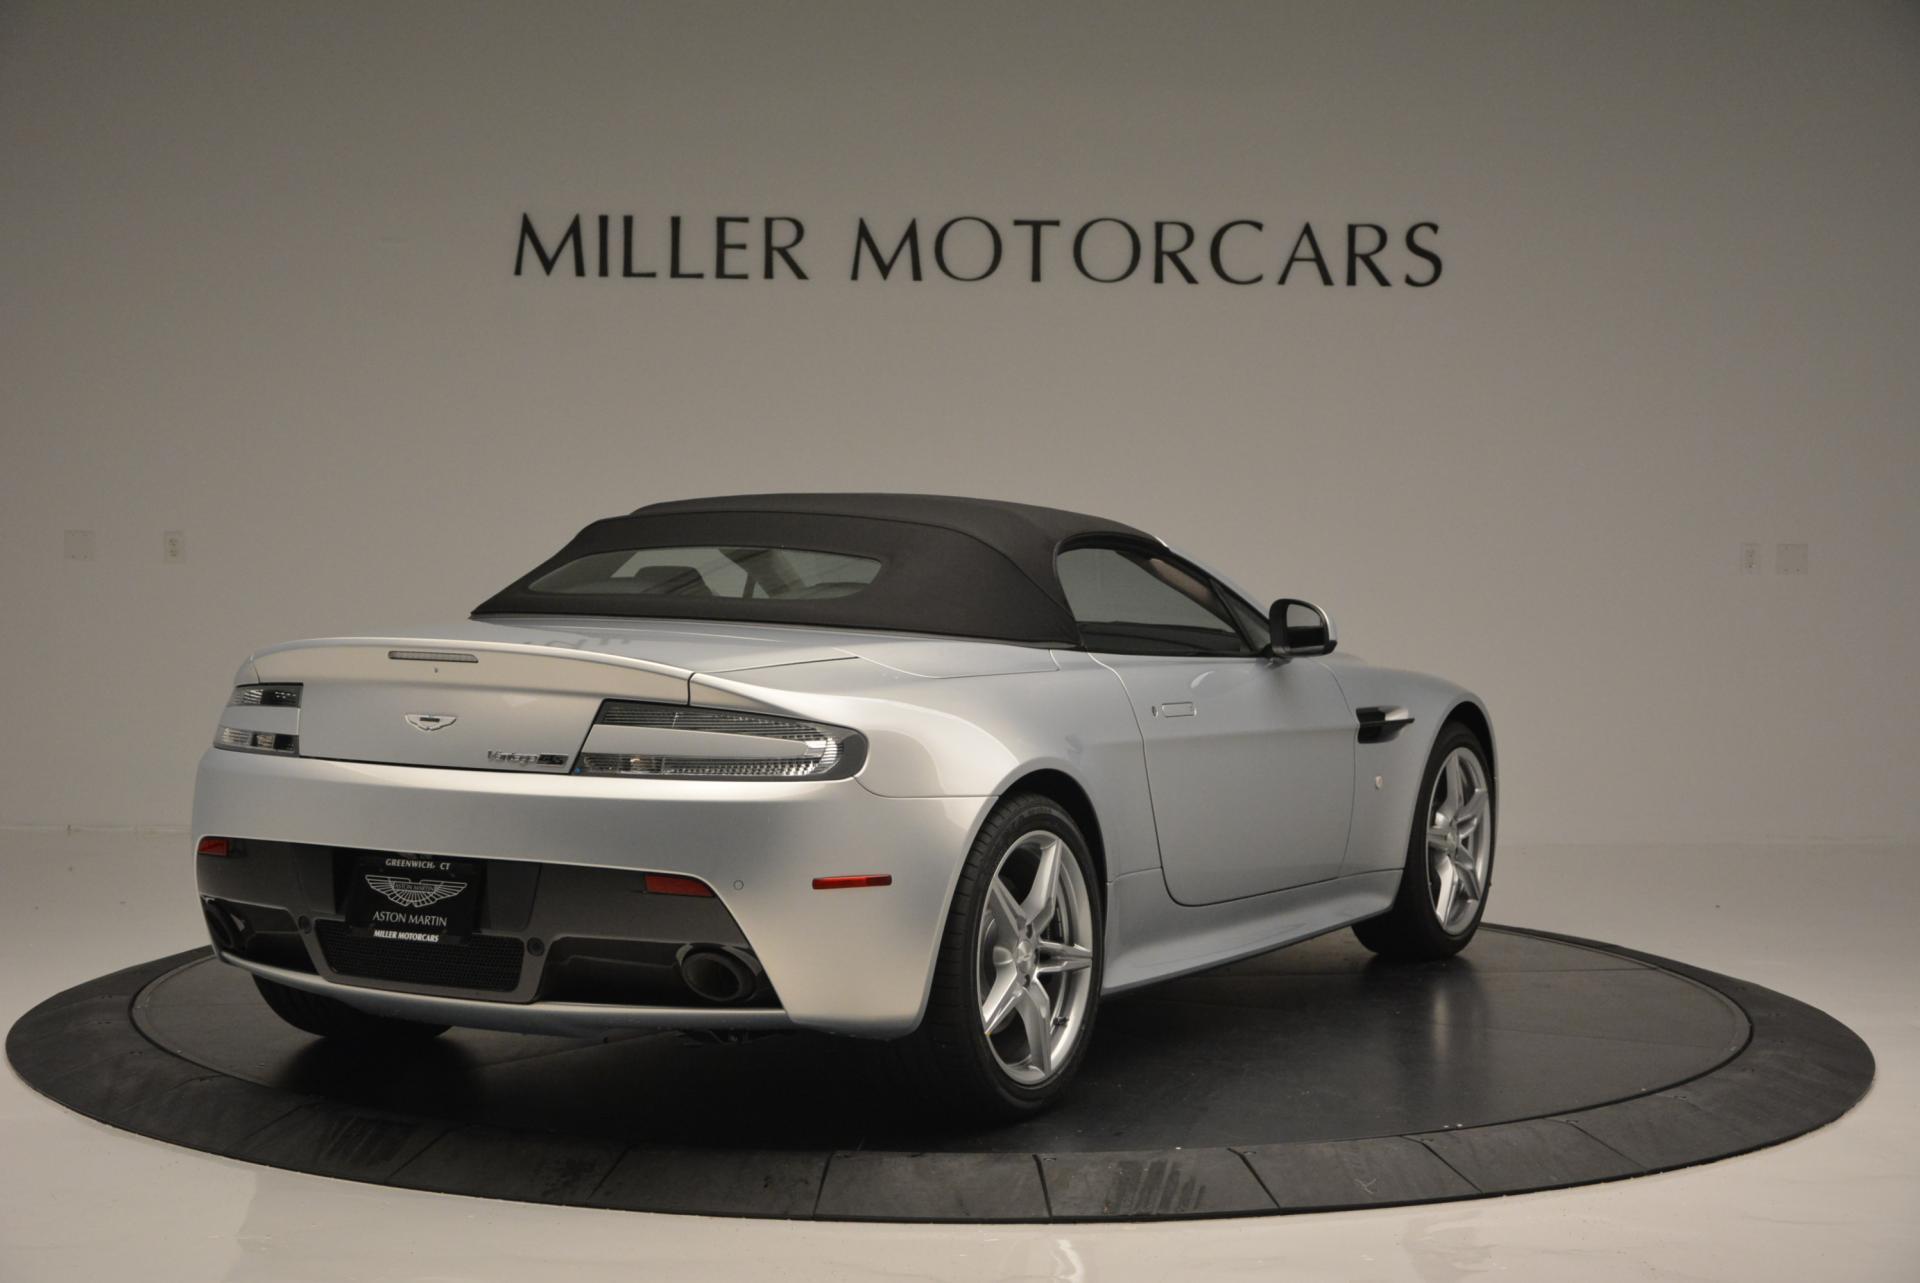 New 2016 Aston Martin V8 Vantage GTS Roadster